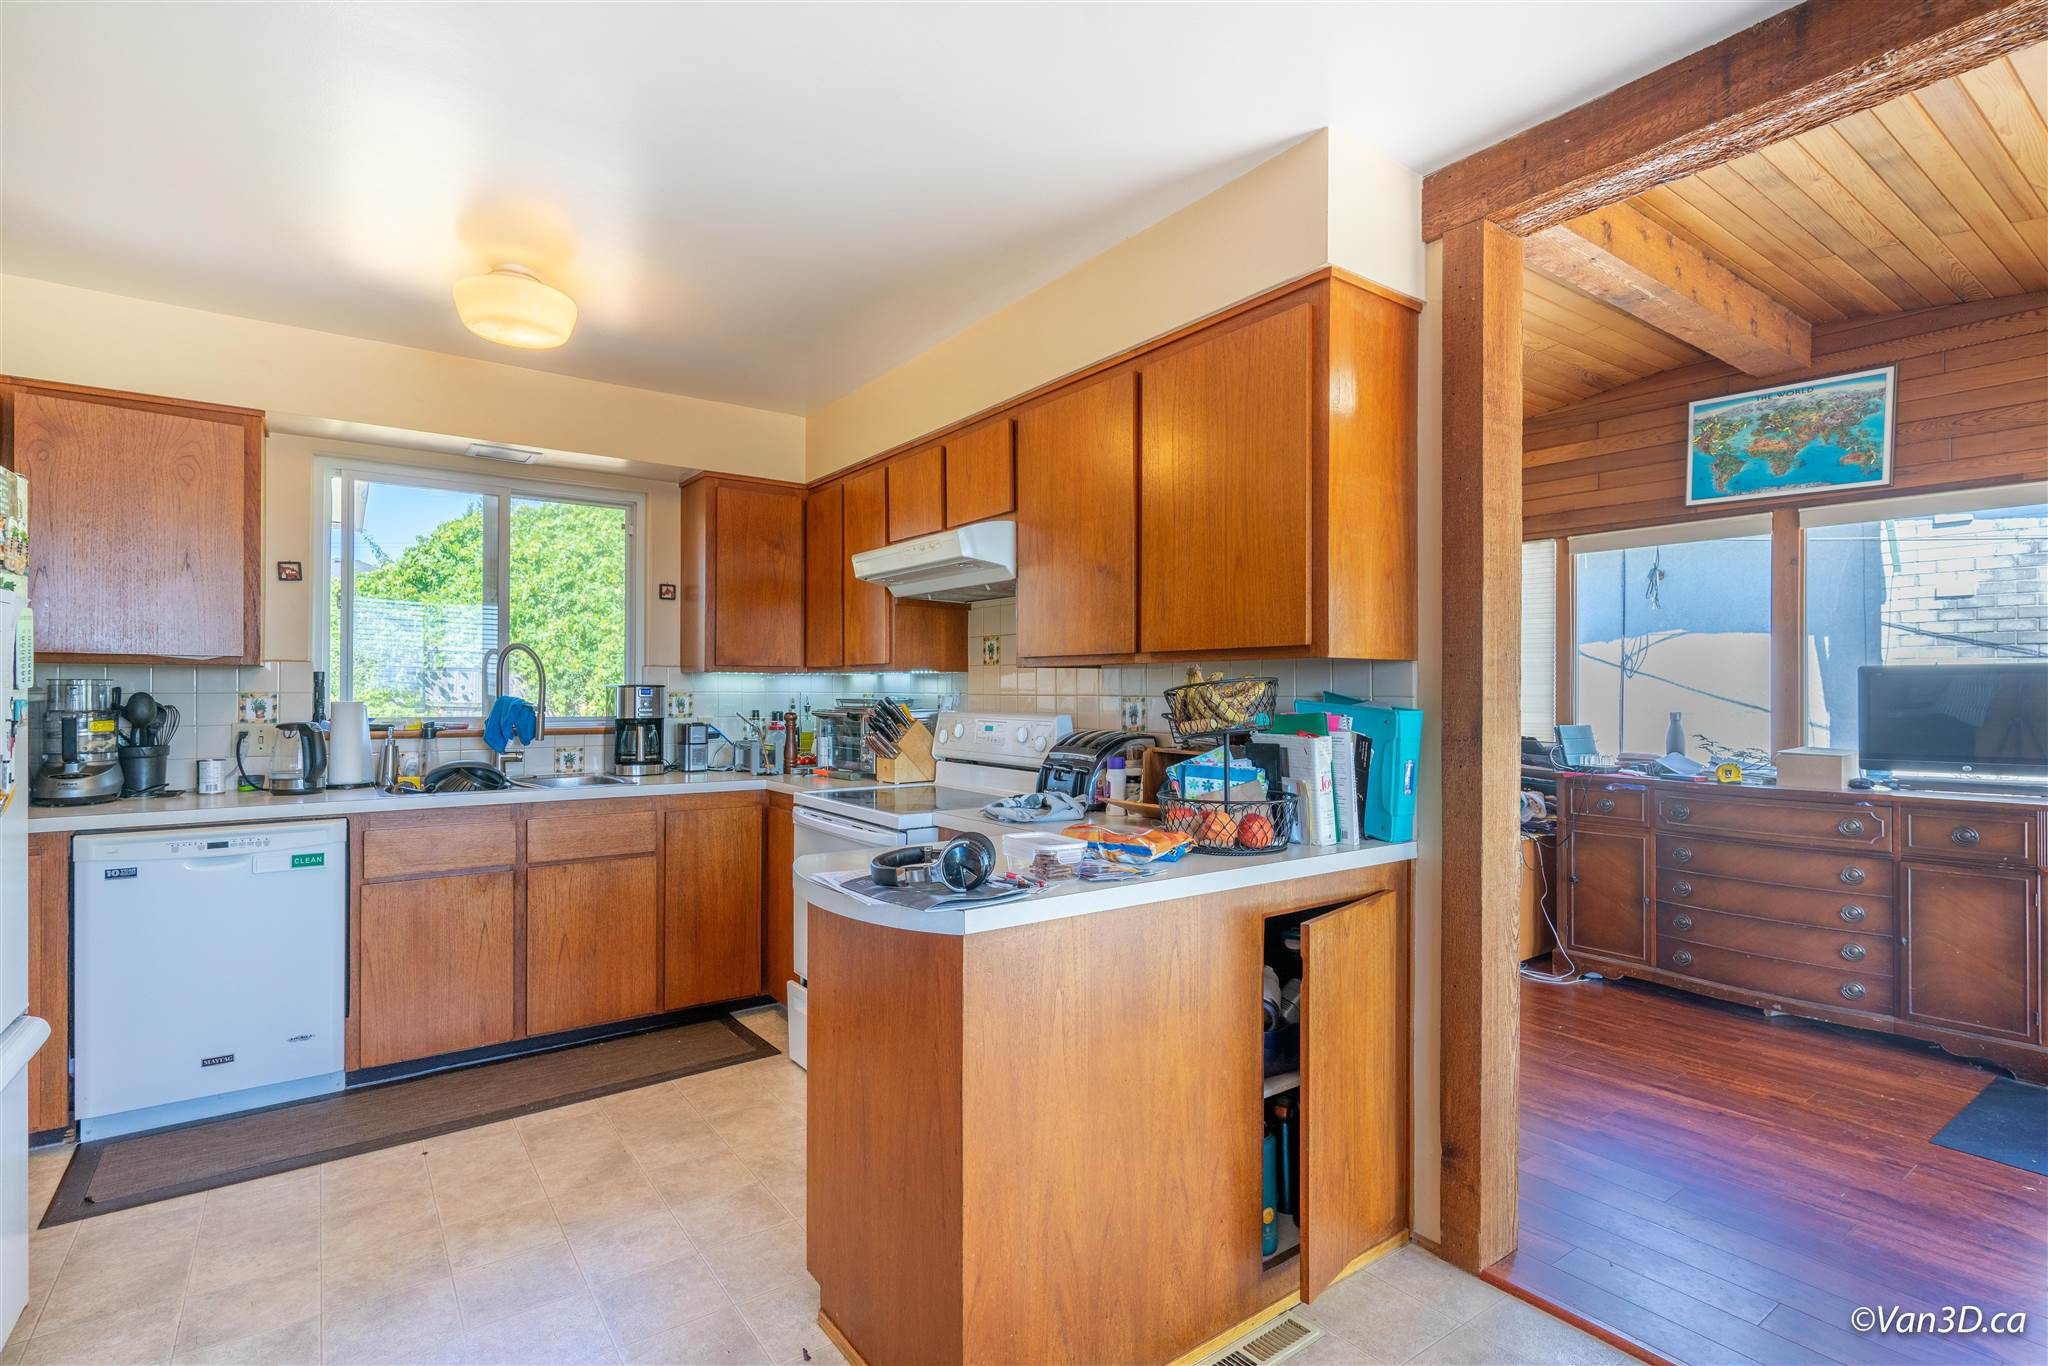 14495 MANN PARK CRESCENT - White Rock House/Single Family for sale, 4 Bedrooms (R2604561) - #25